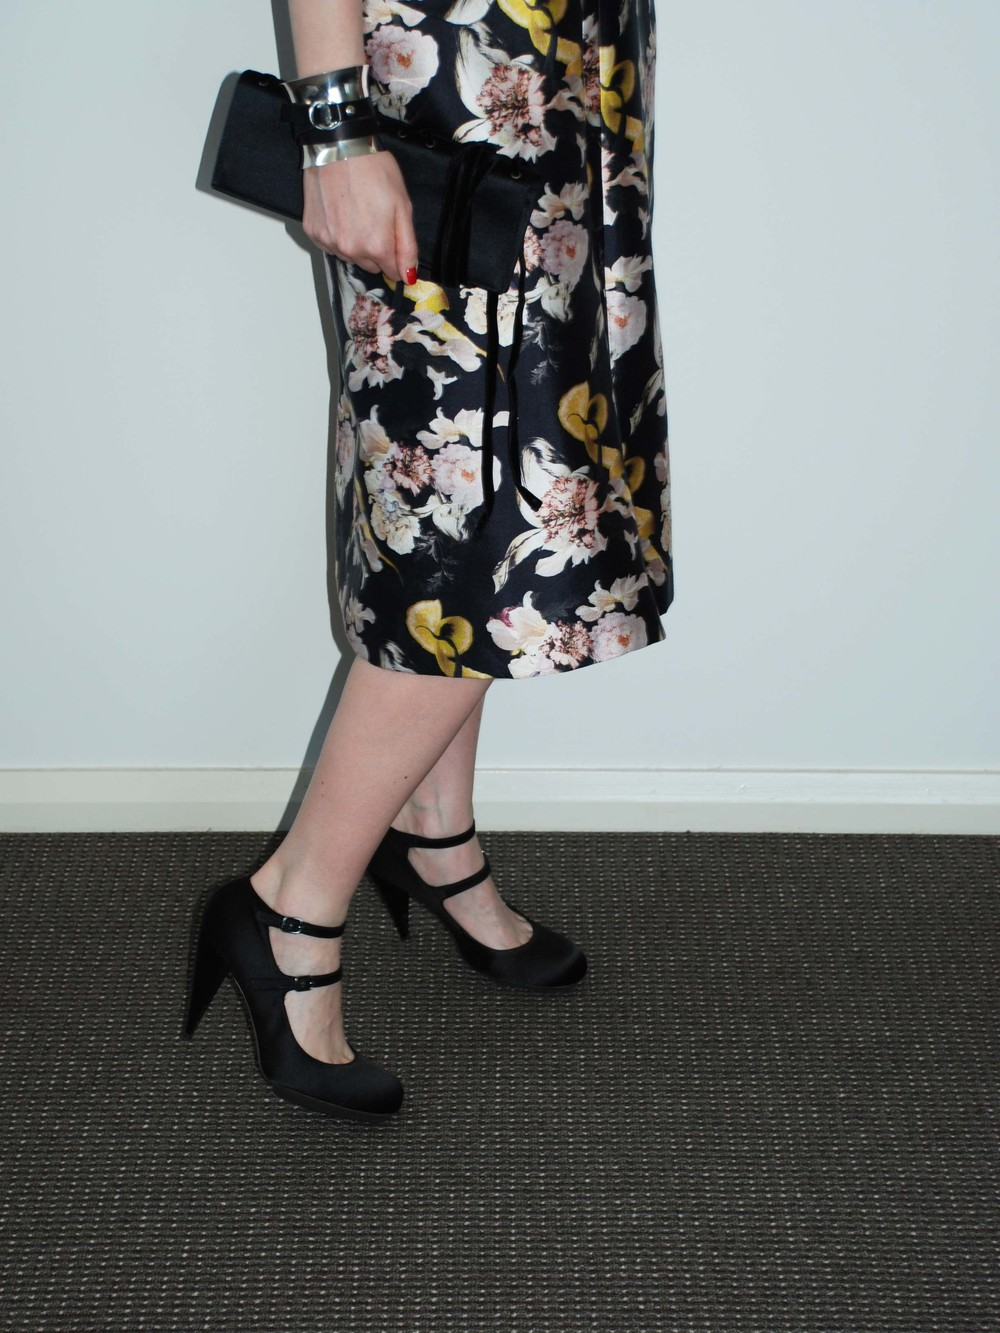 Ellery Dartagnan Dress with A-Line Skirt (Myer, $950AUD), Yves Saint Laurent Vintage Clutch (Ebay), Lanvin Shoes, GeorgJensen Cuff